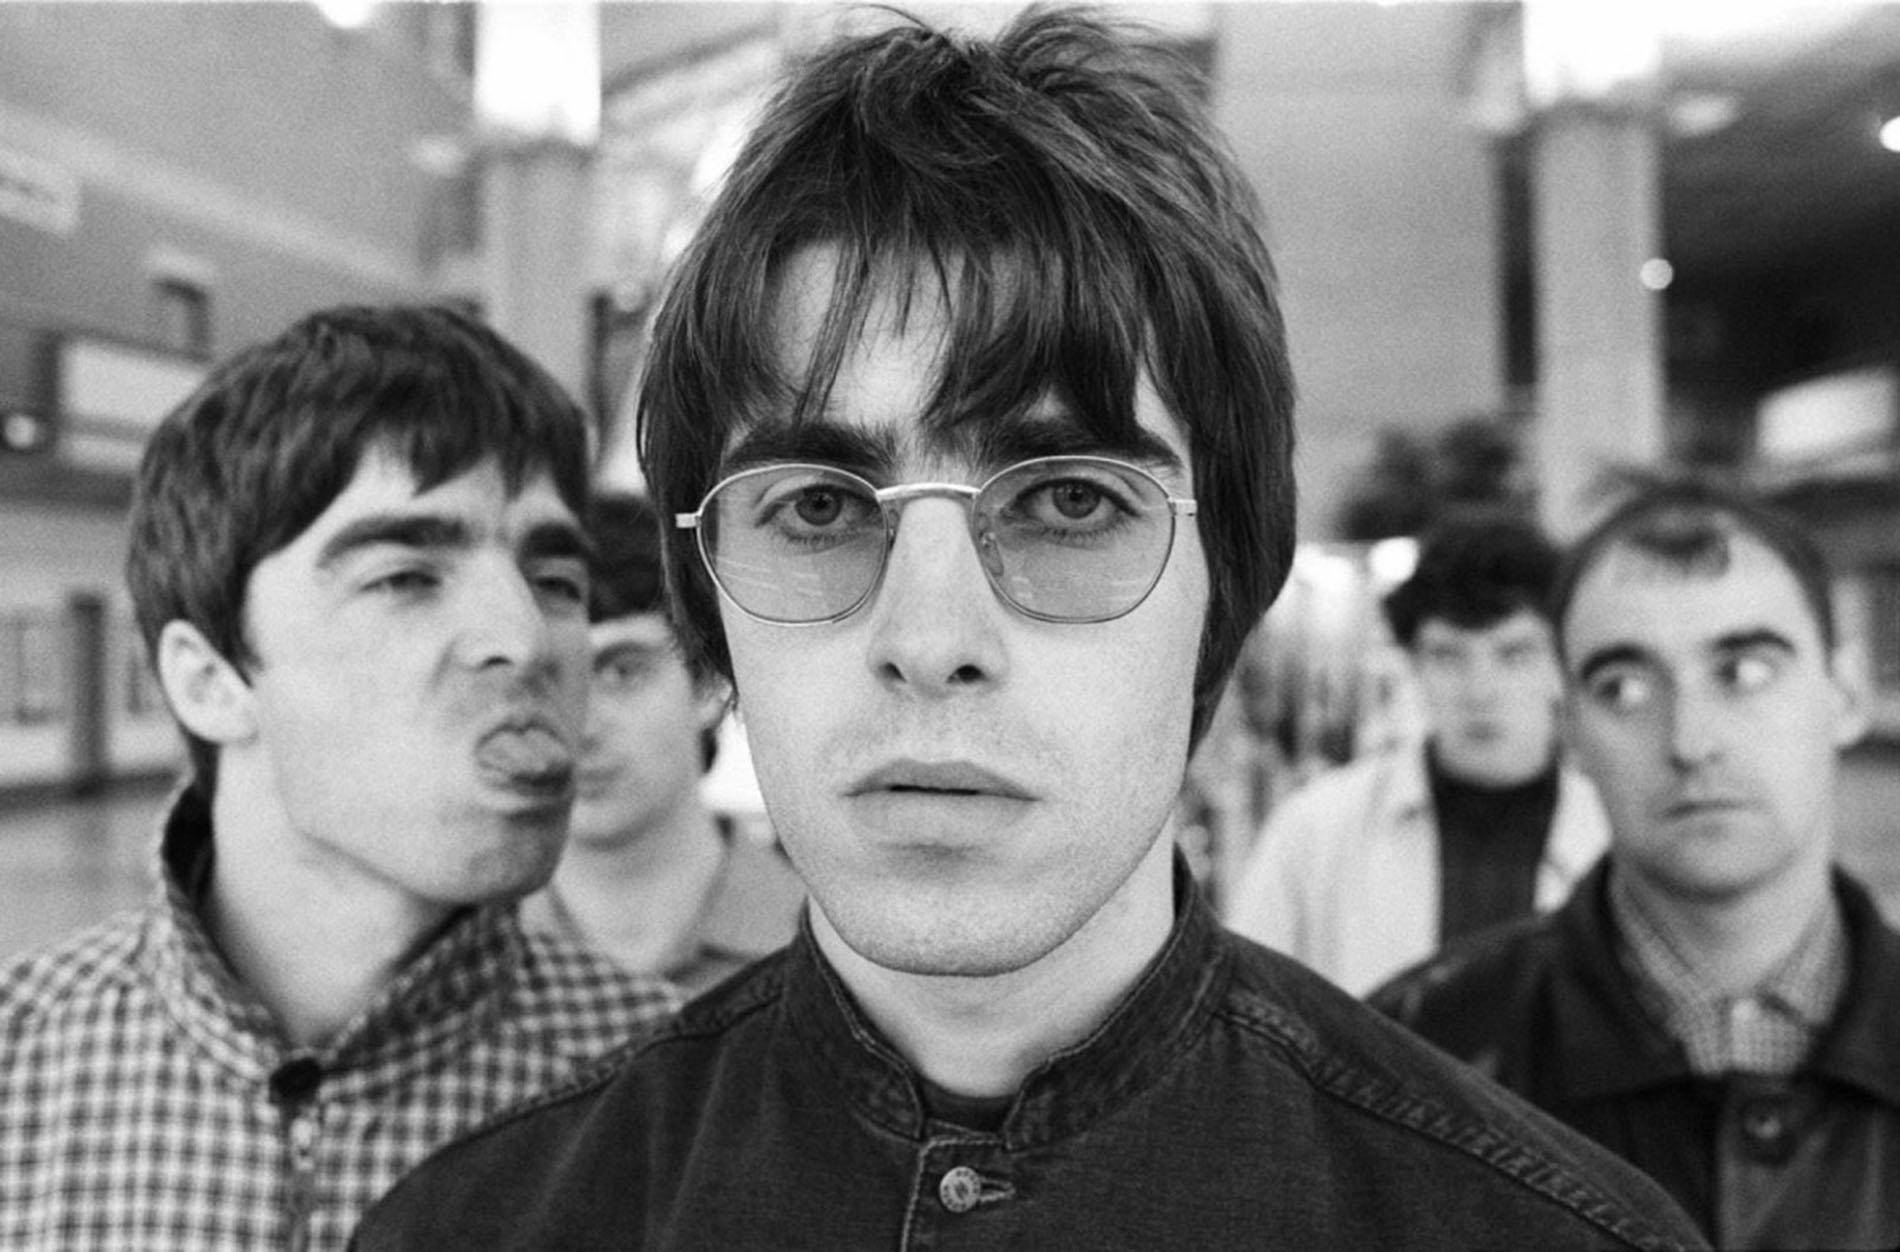 Liam Gallagher - Featured